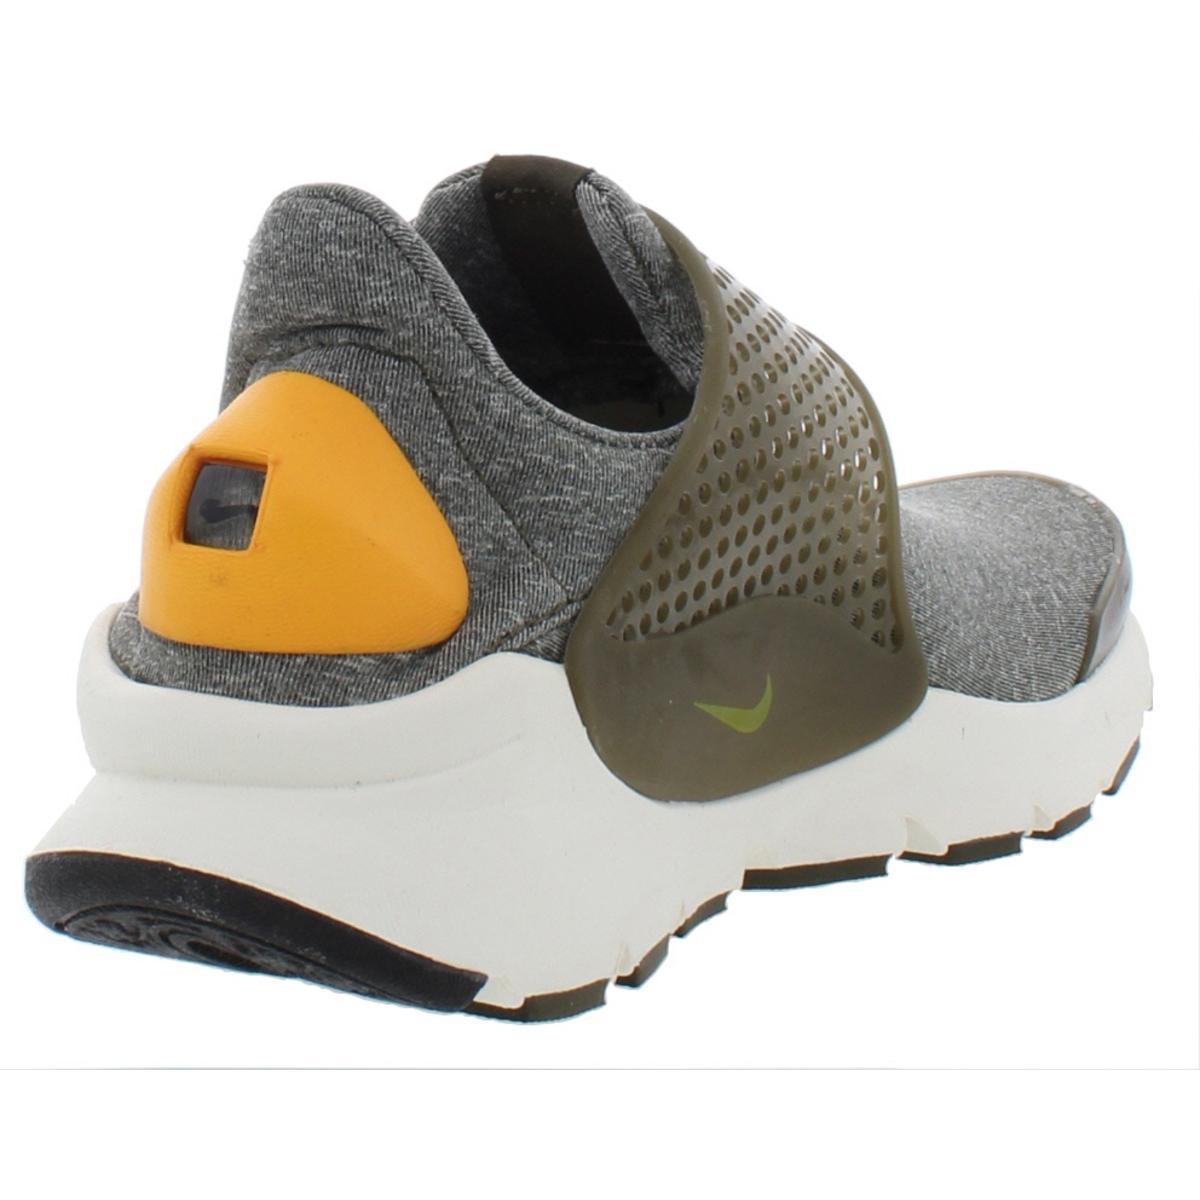 Nike-Womens-Sock-Dart-SE-Running-Low-Top-Athletic-Shoes-Sneakers-BHFO-3394 thumbnail 4